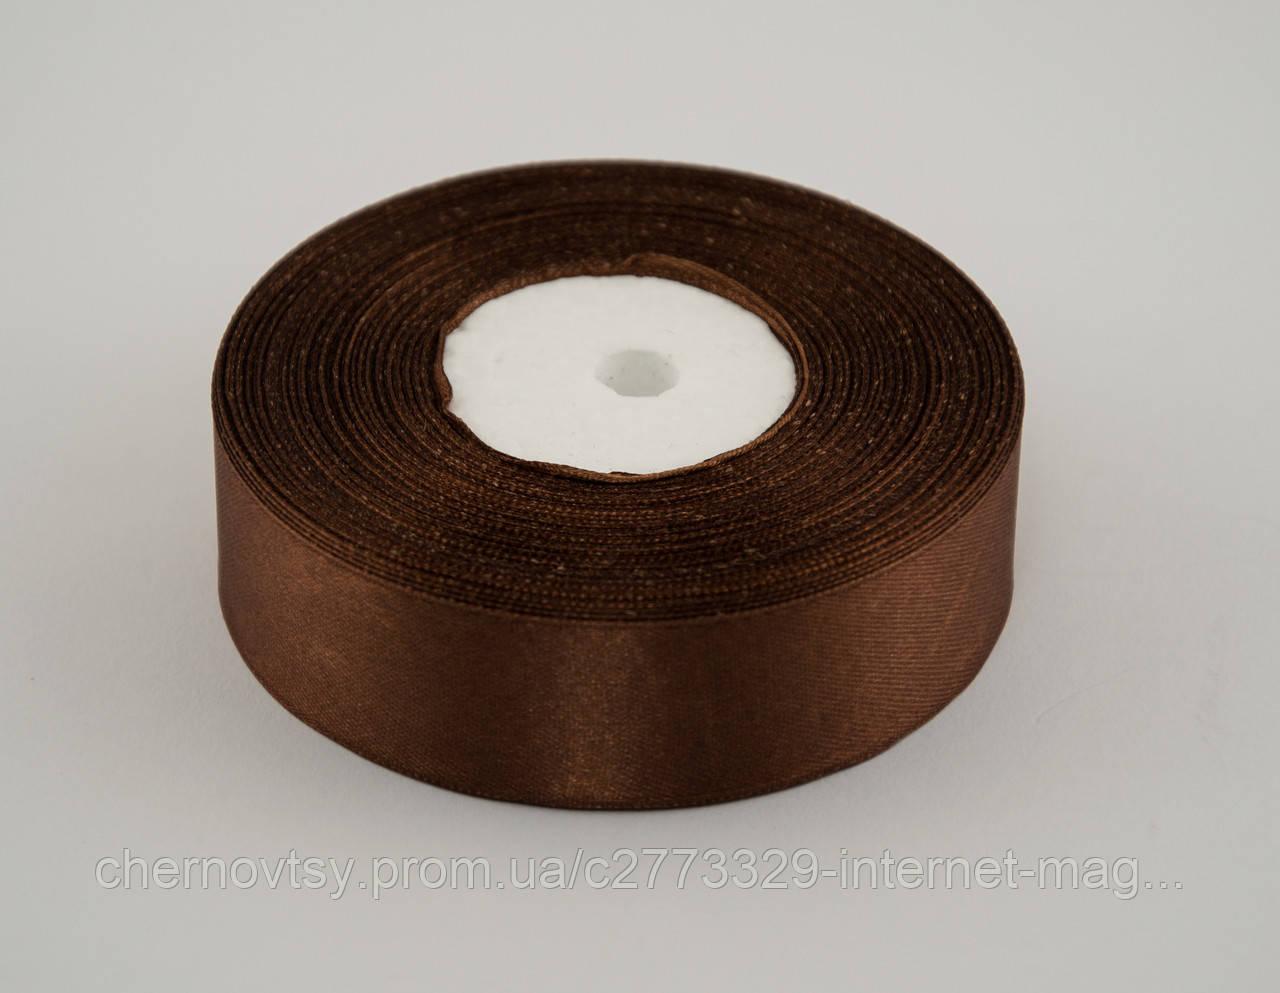 Лента атлас 5 см, 33 м, № 177 коричневая